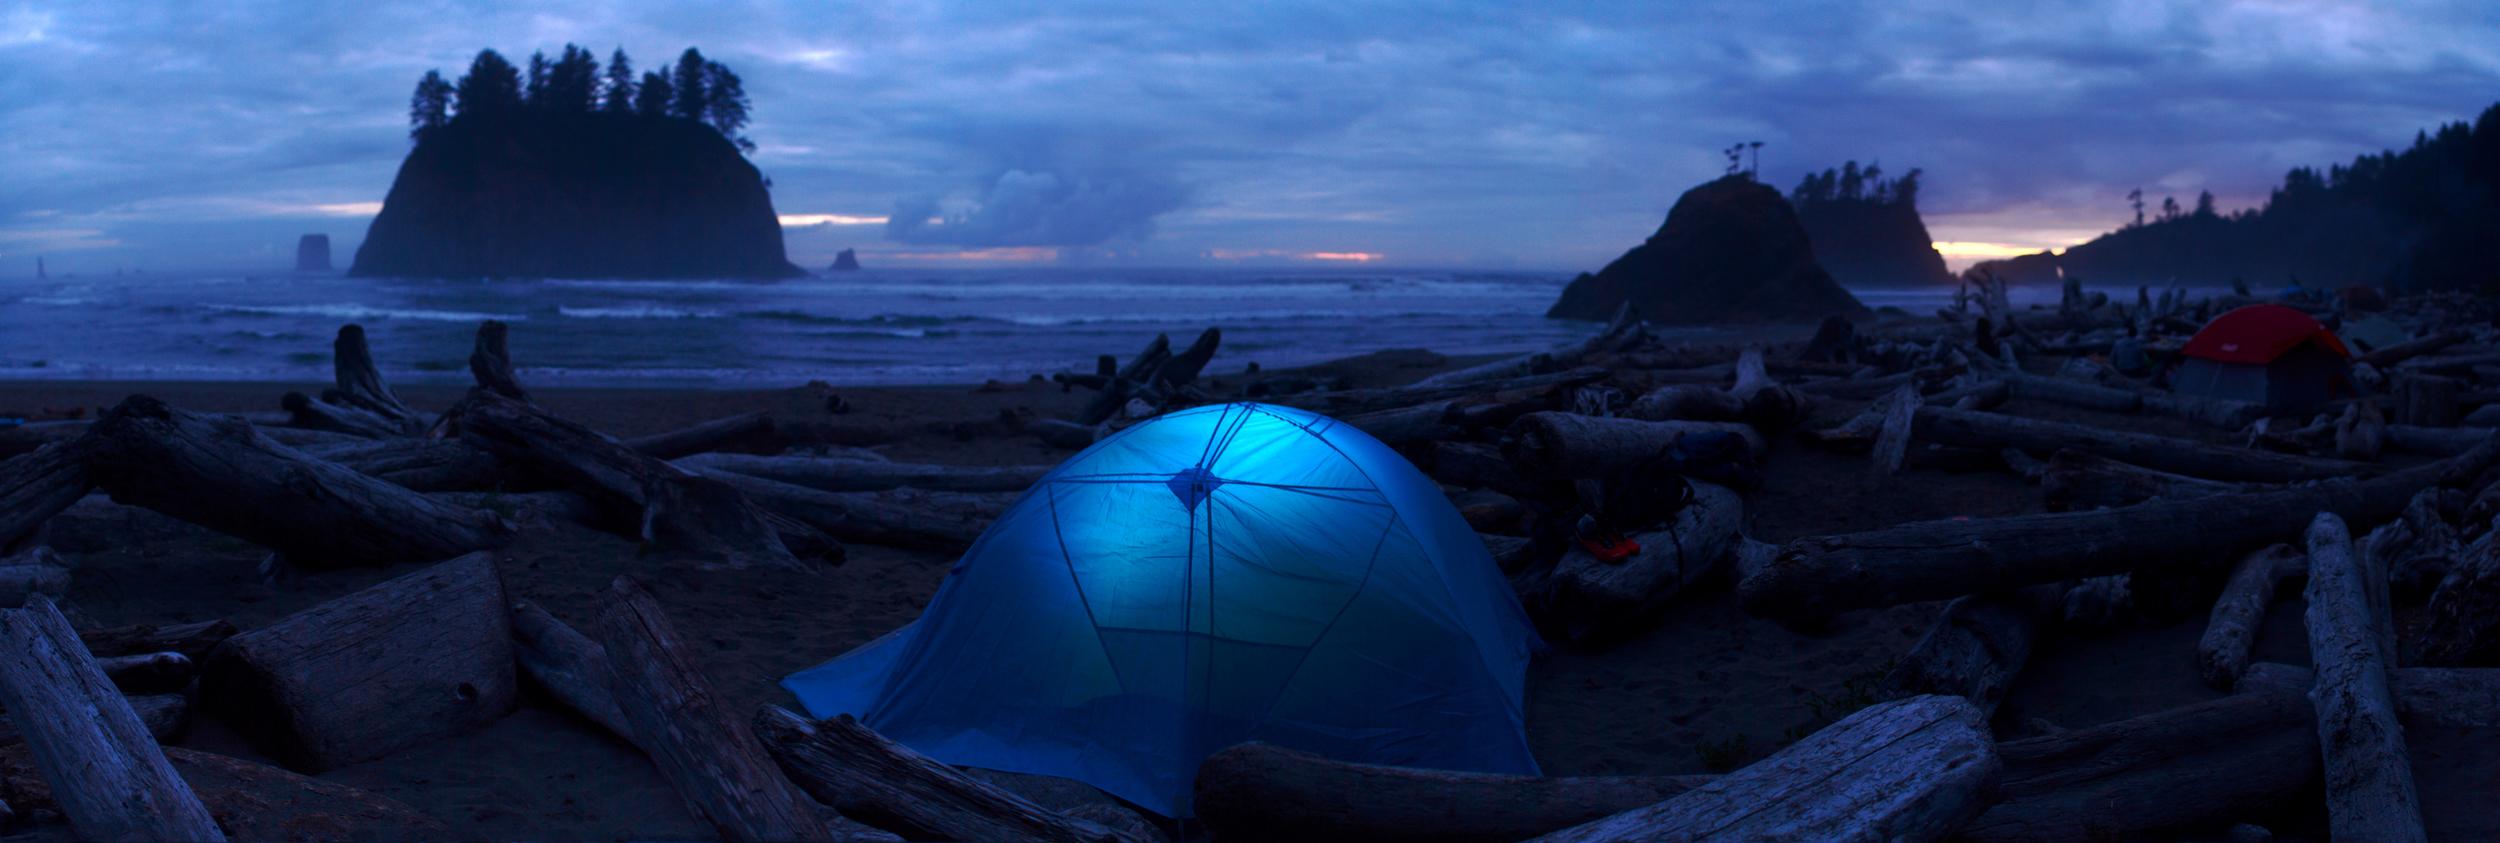 tent night 1 small.jpg